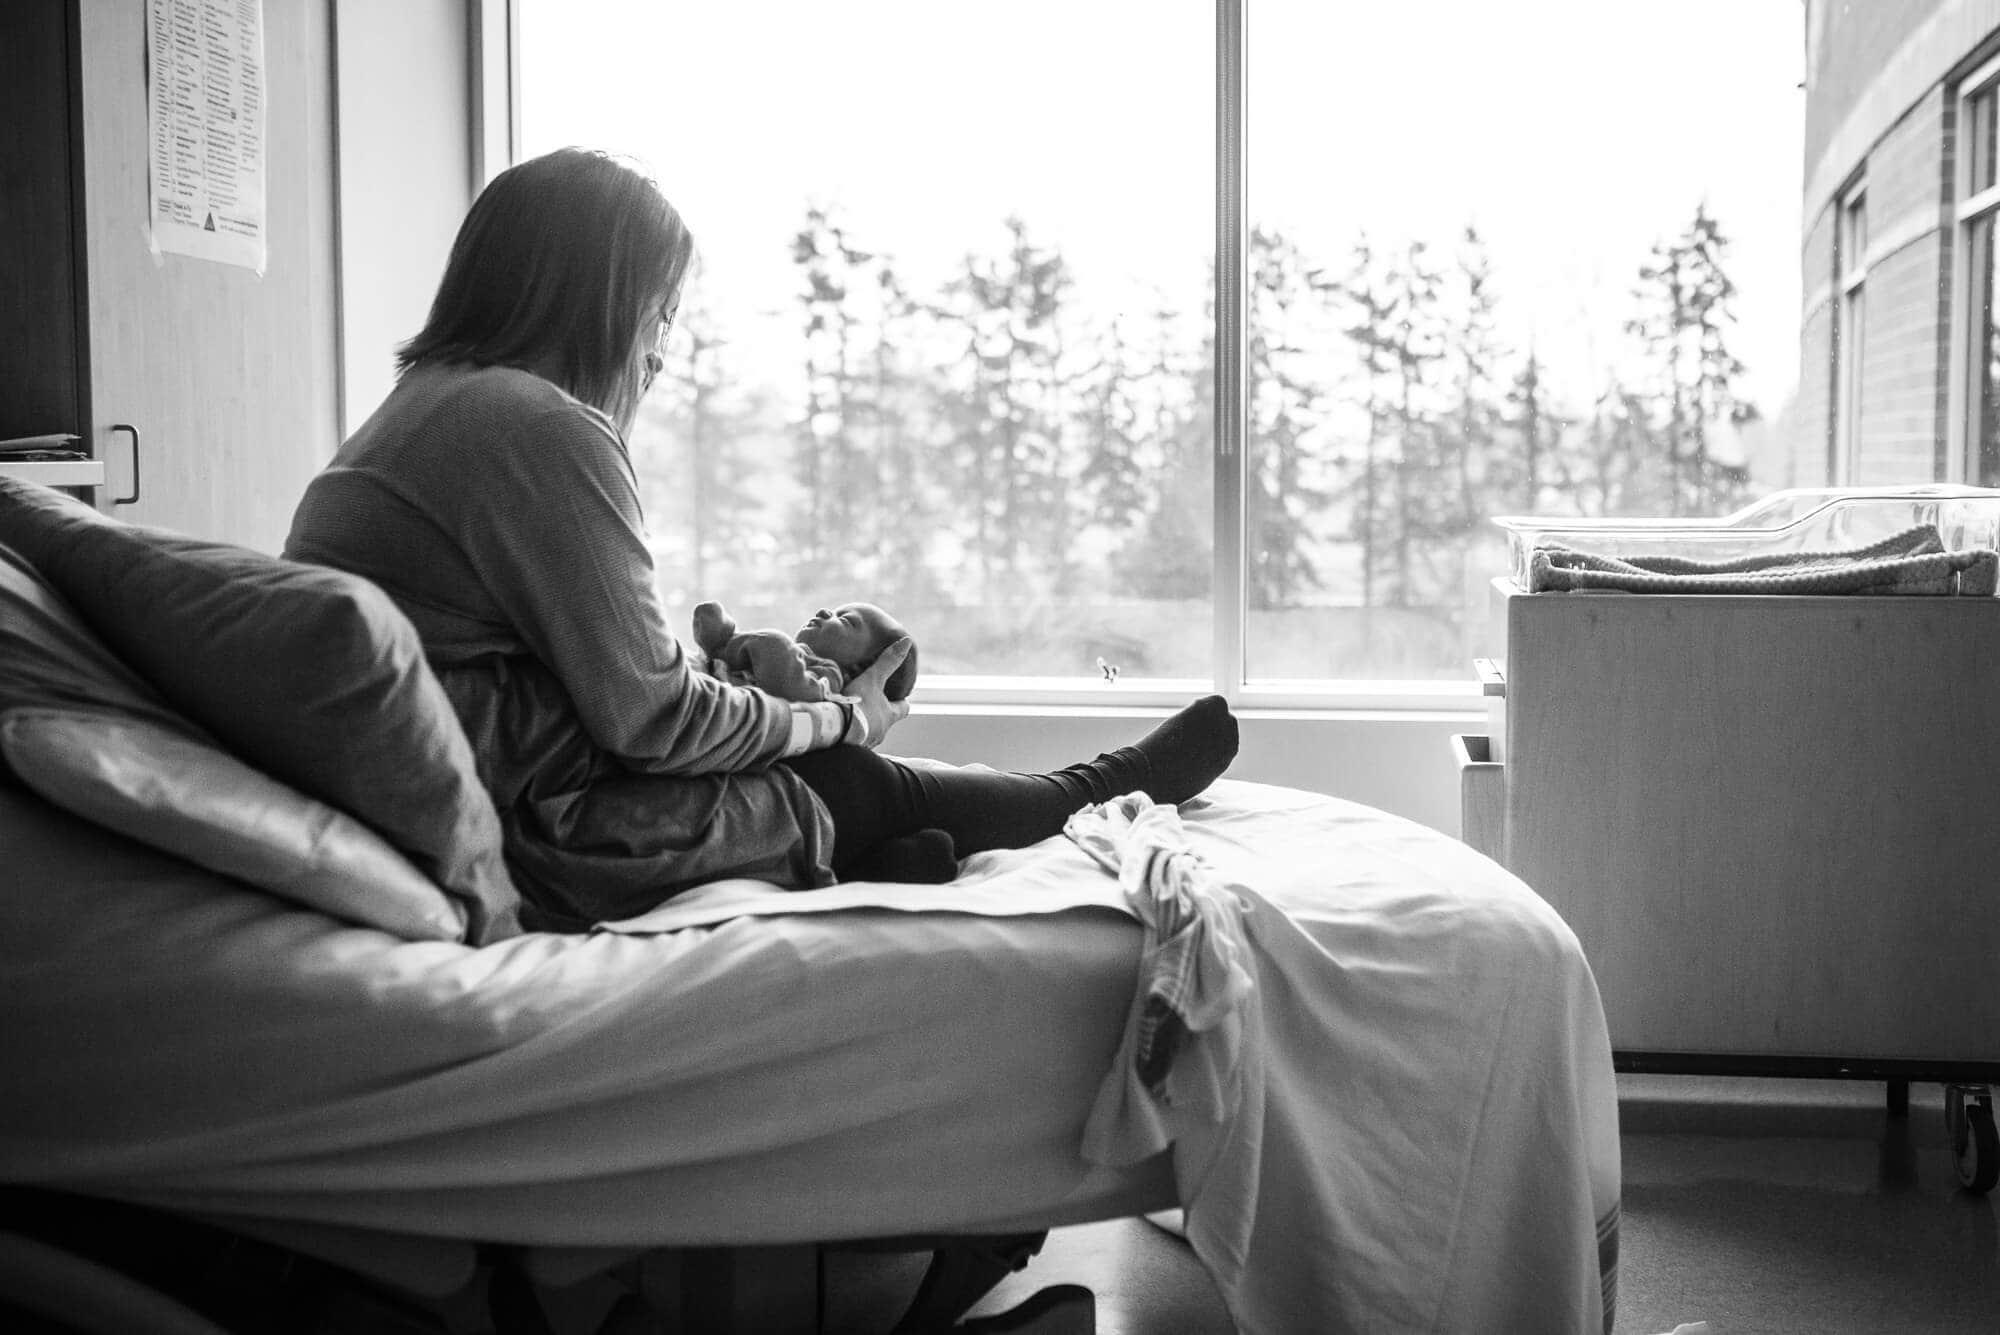 fresh 48 mom and newborn in hospital room